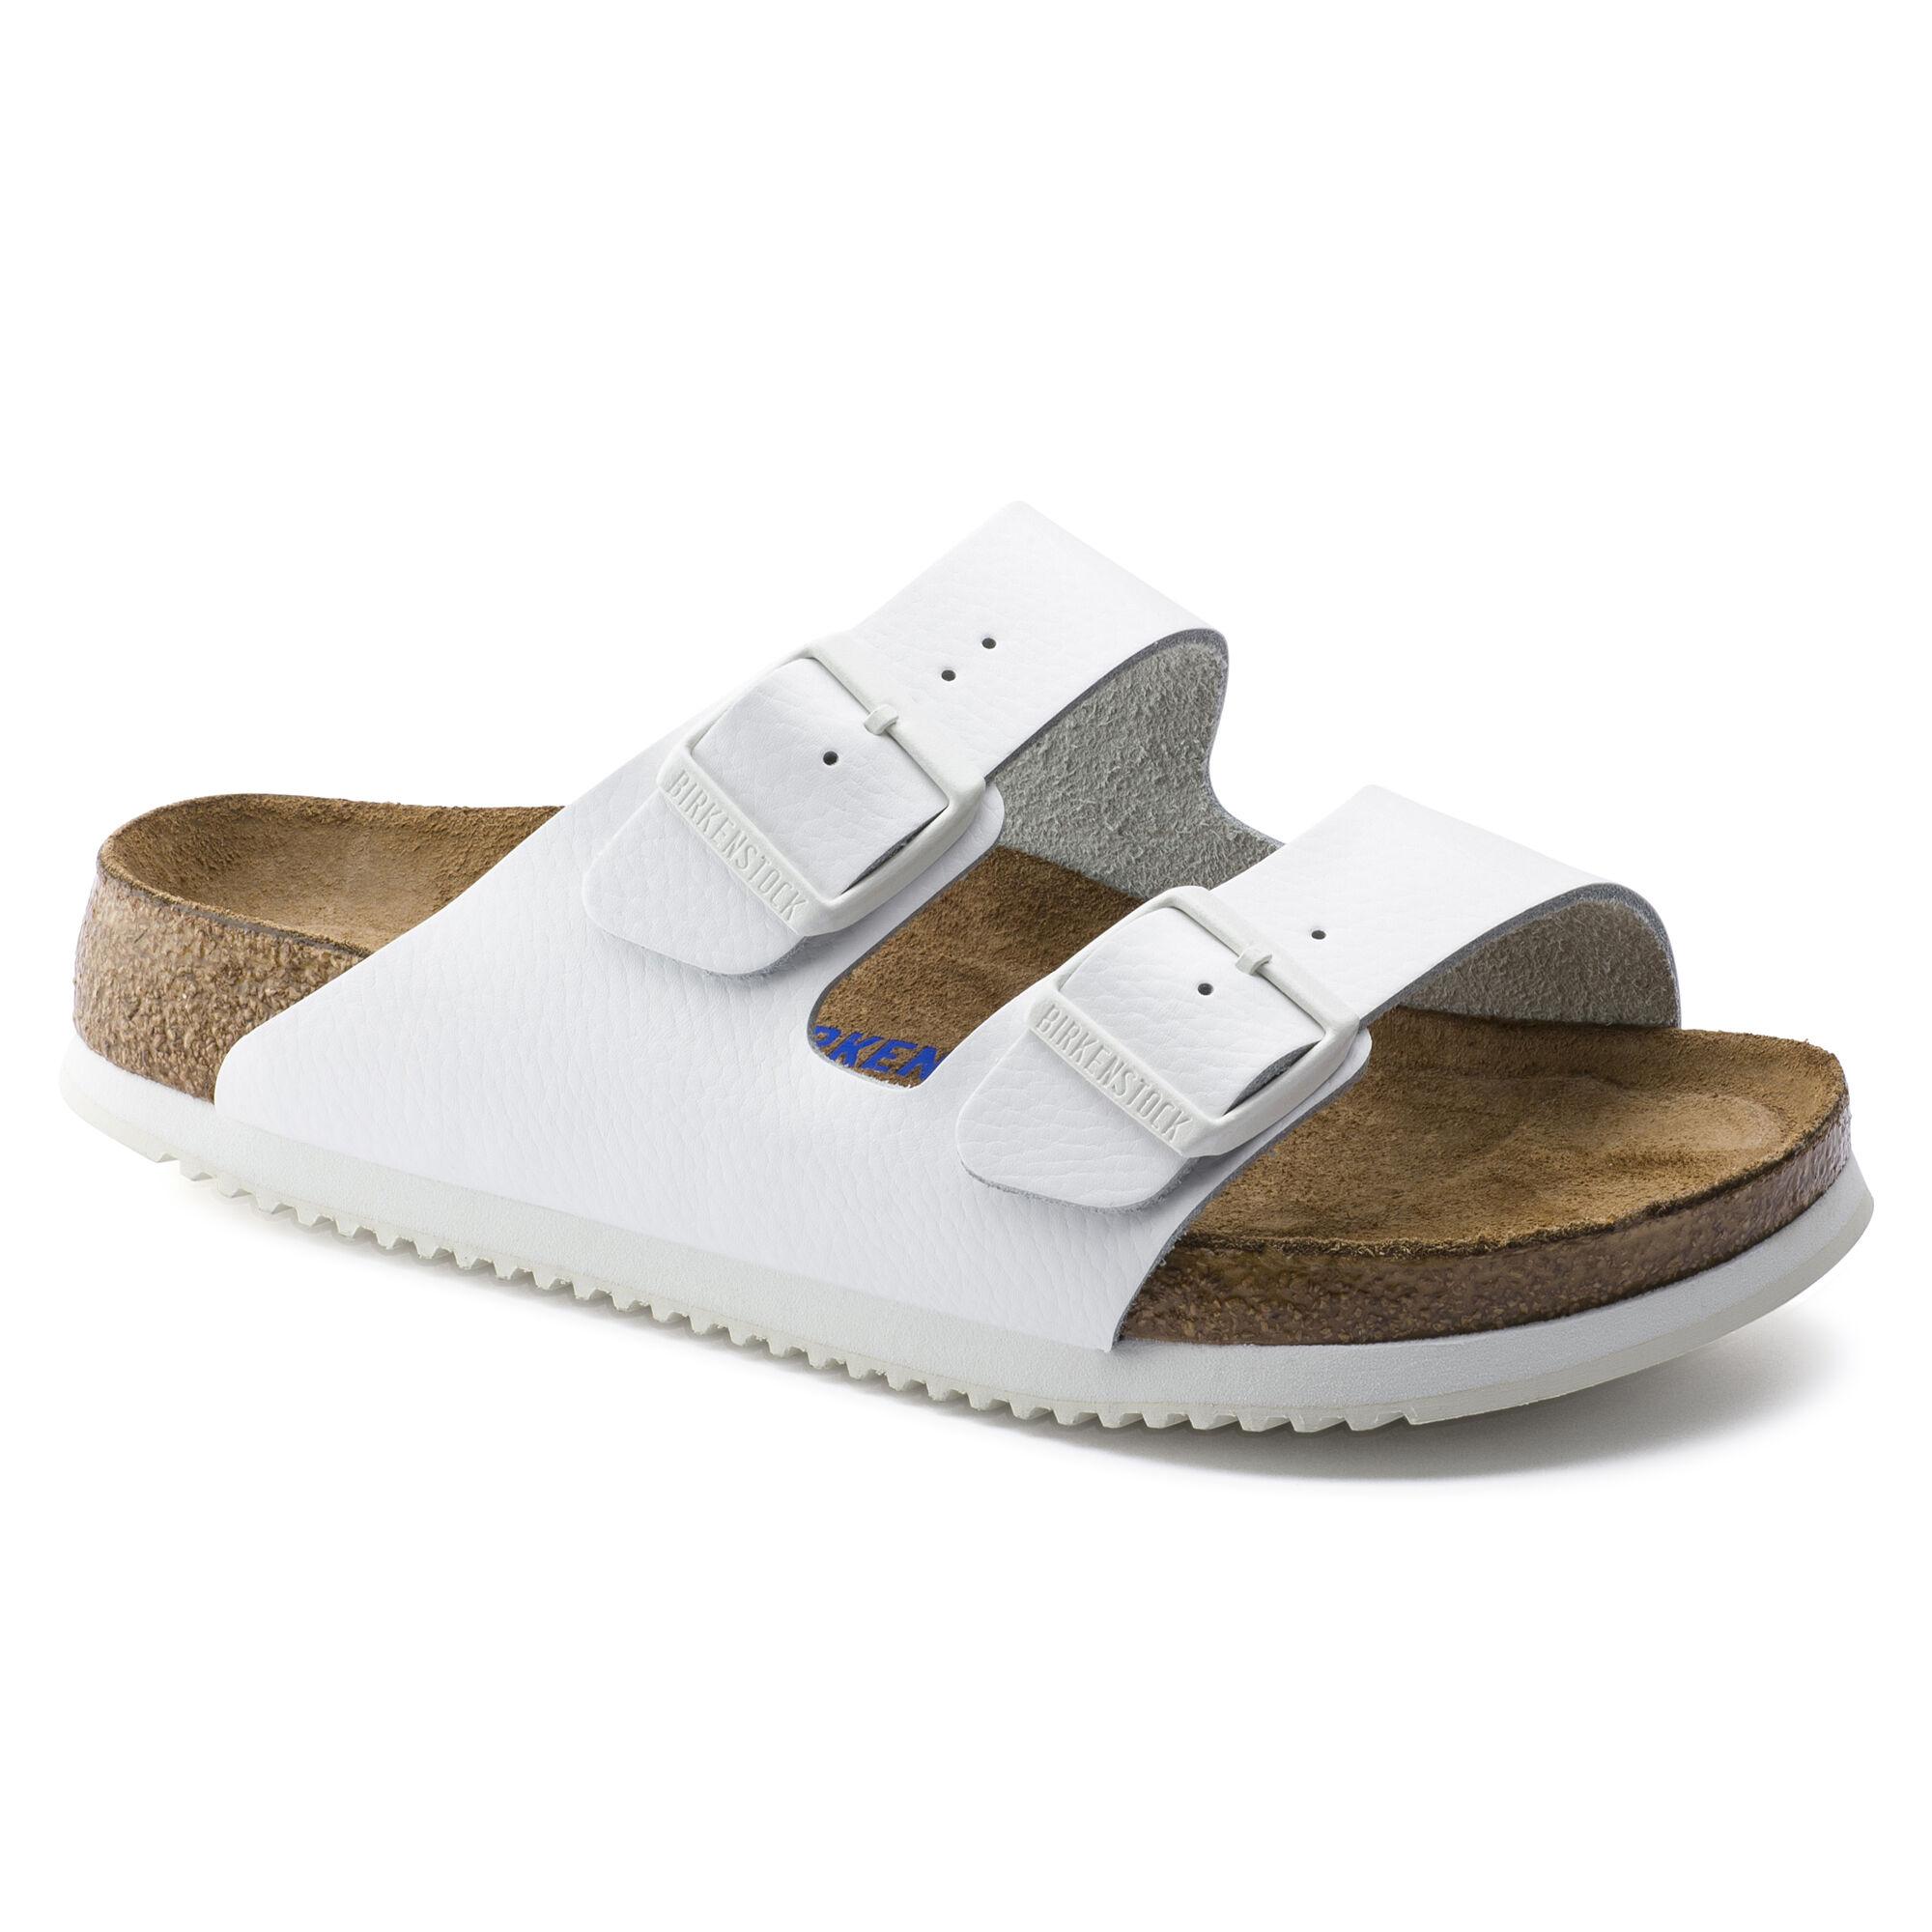 Arizona Natural Leather White | shop